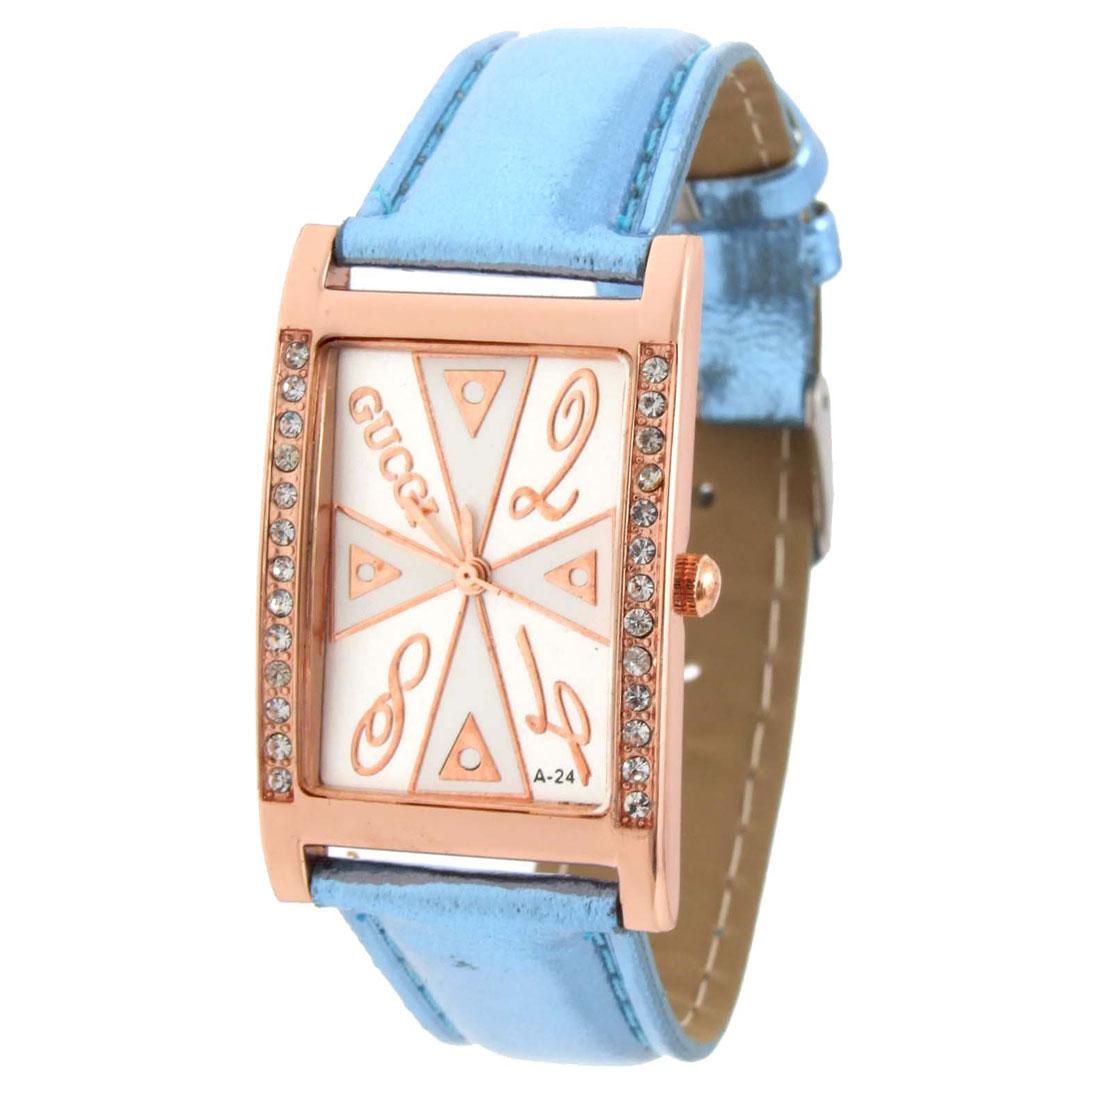 Fashion Jewelry Blue Faux Leather Wrist Quartz Watch - Inactive